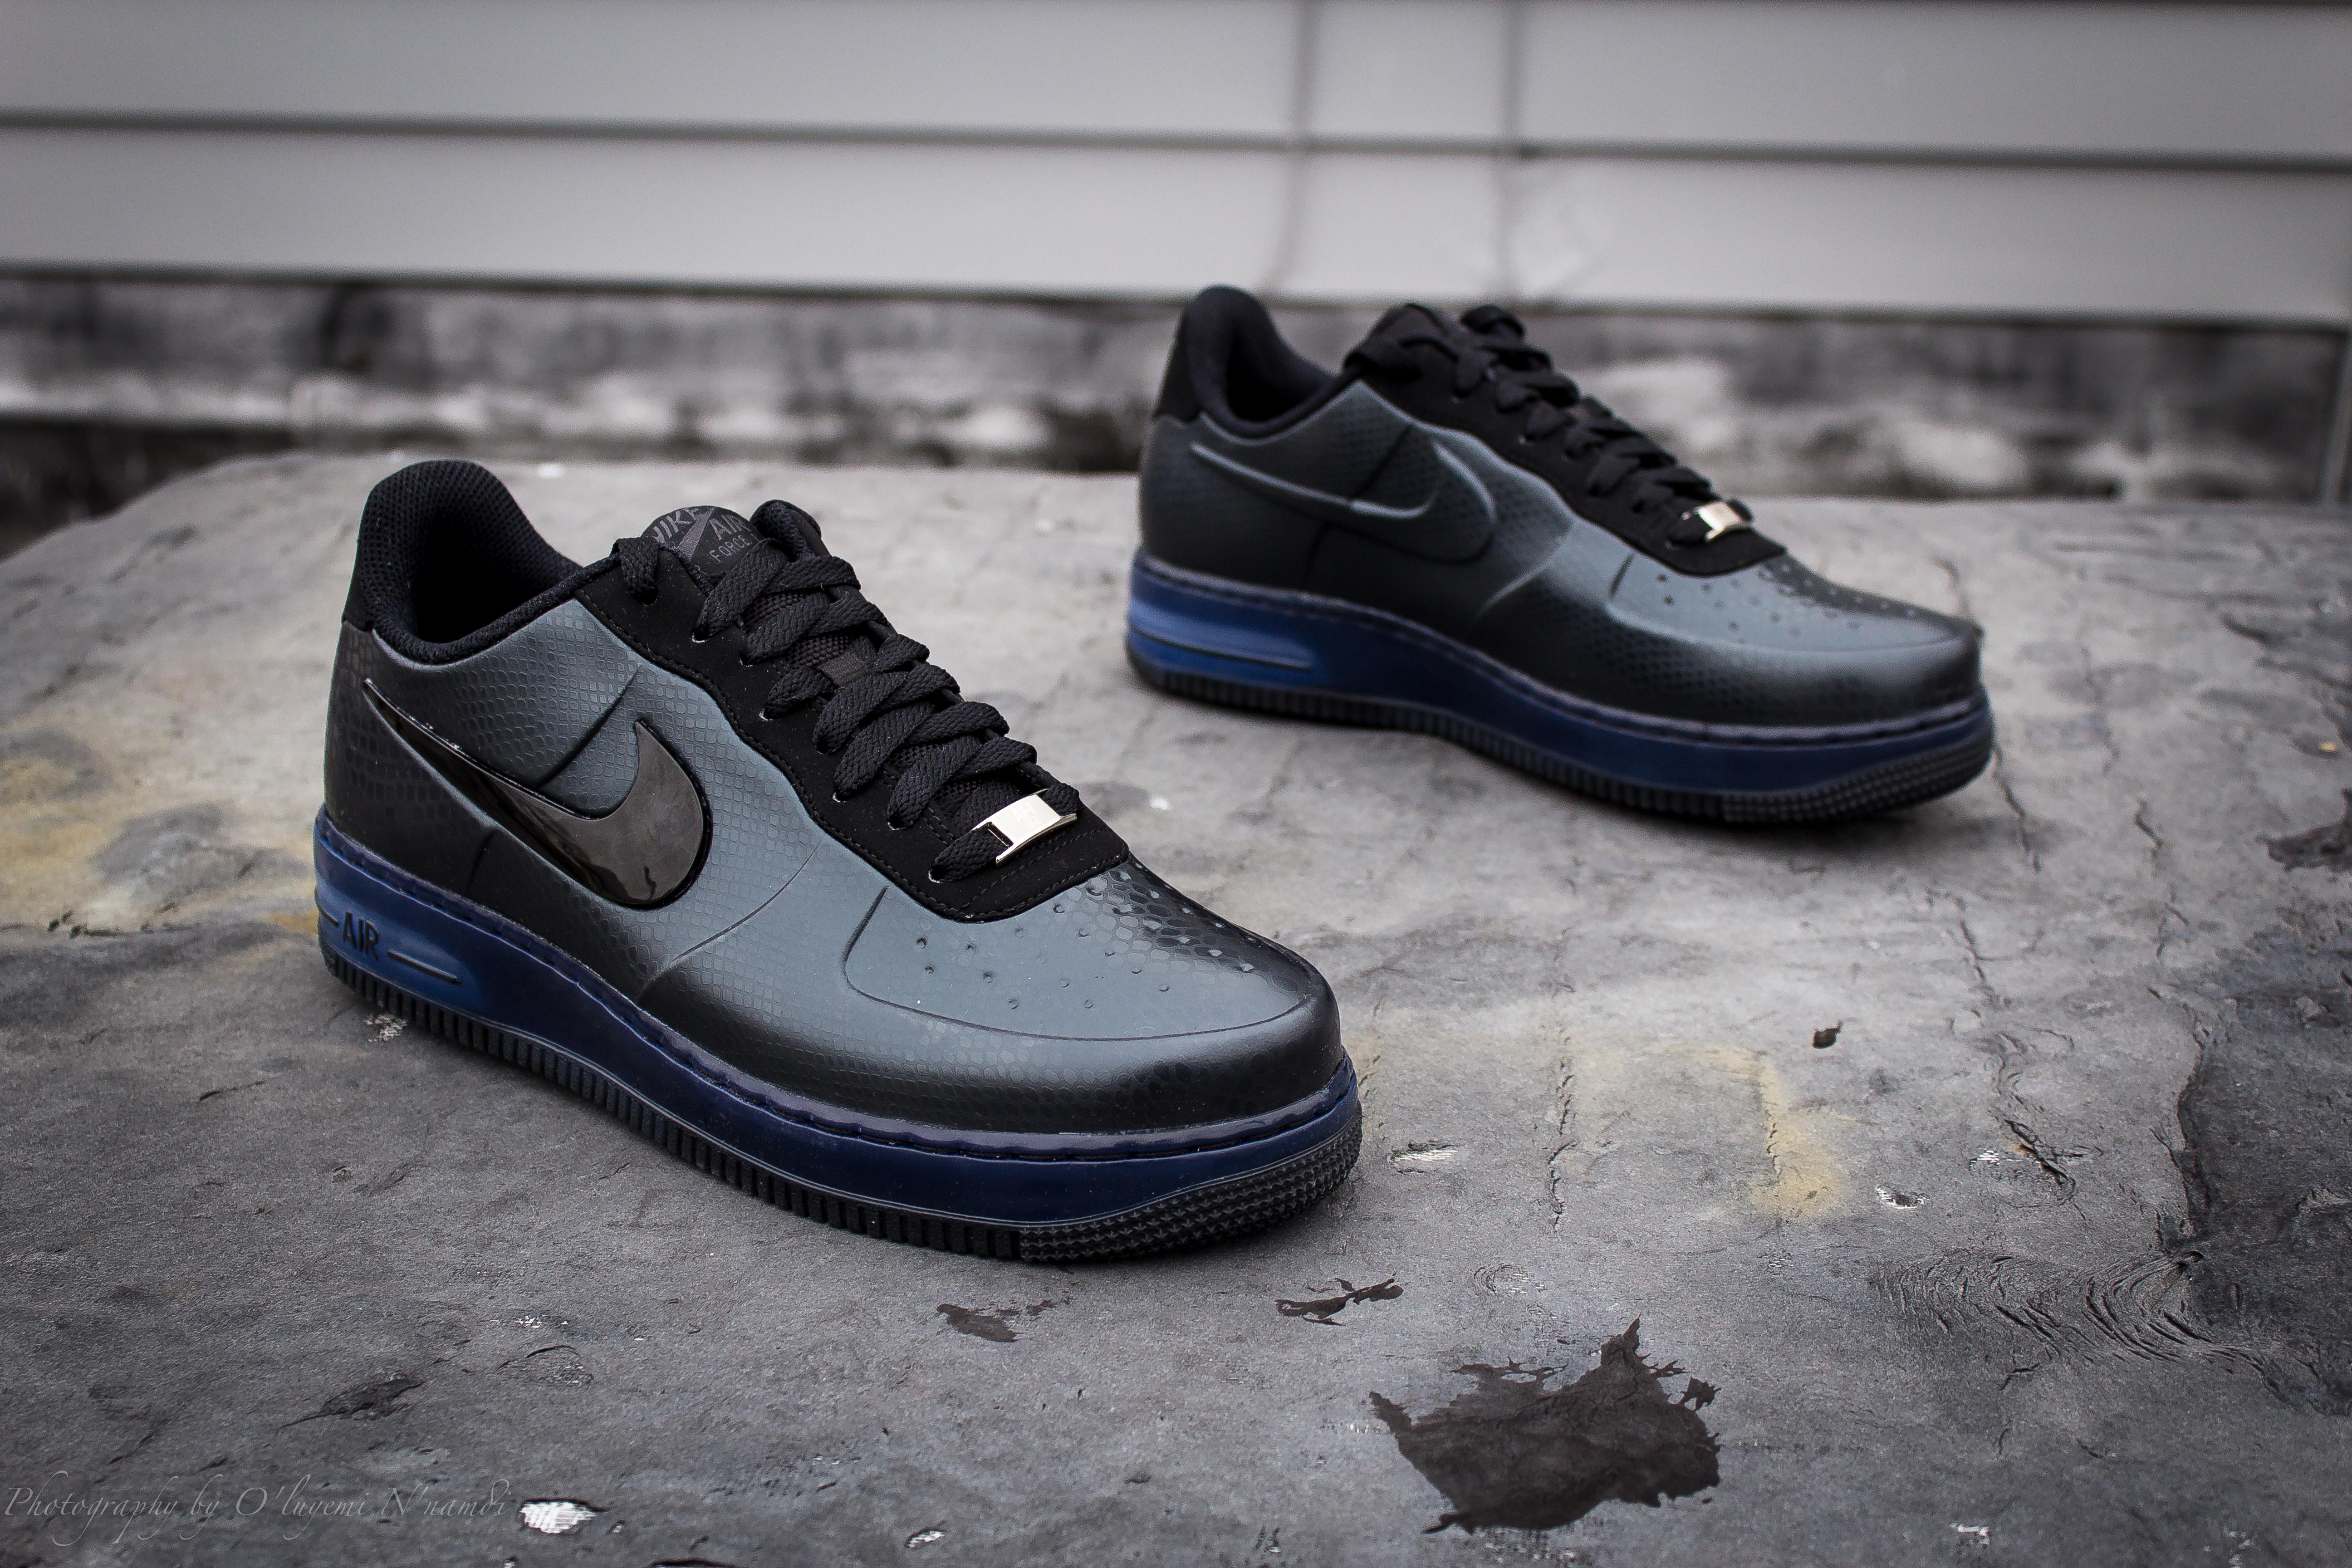 Nike Air Foamposite low